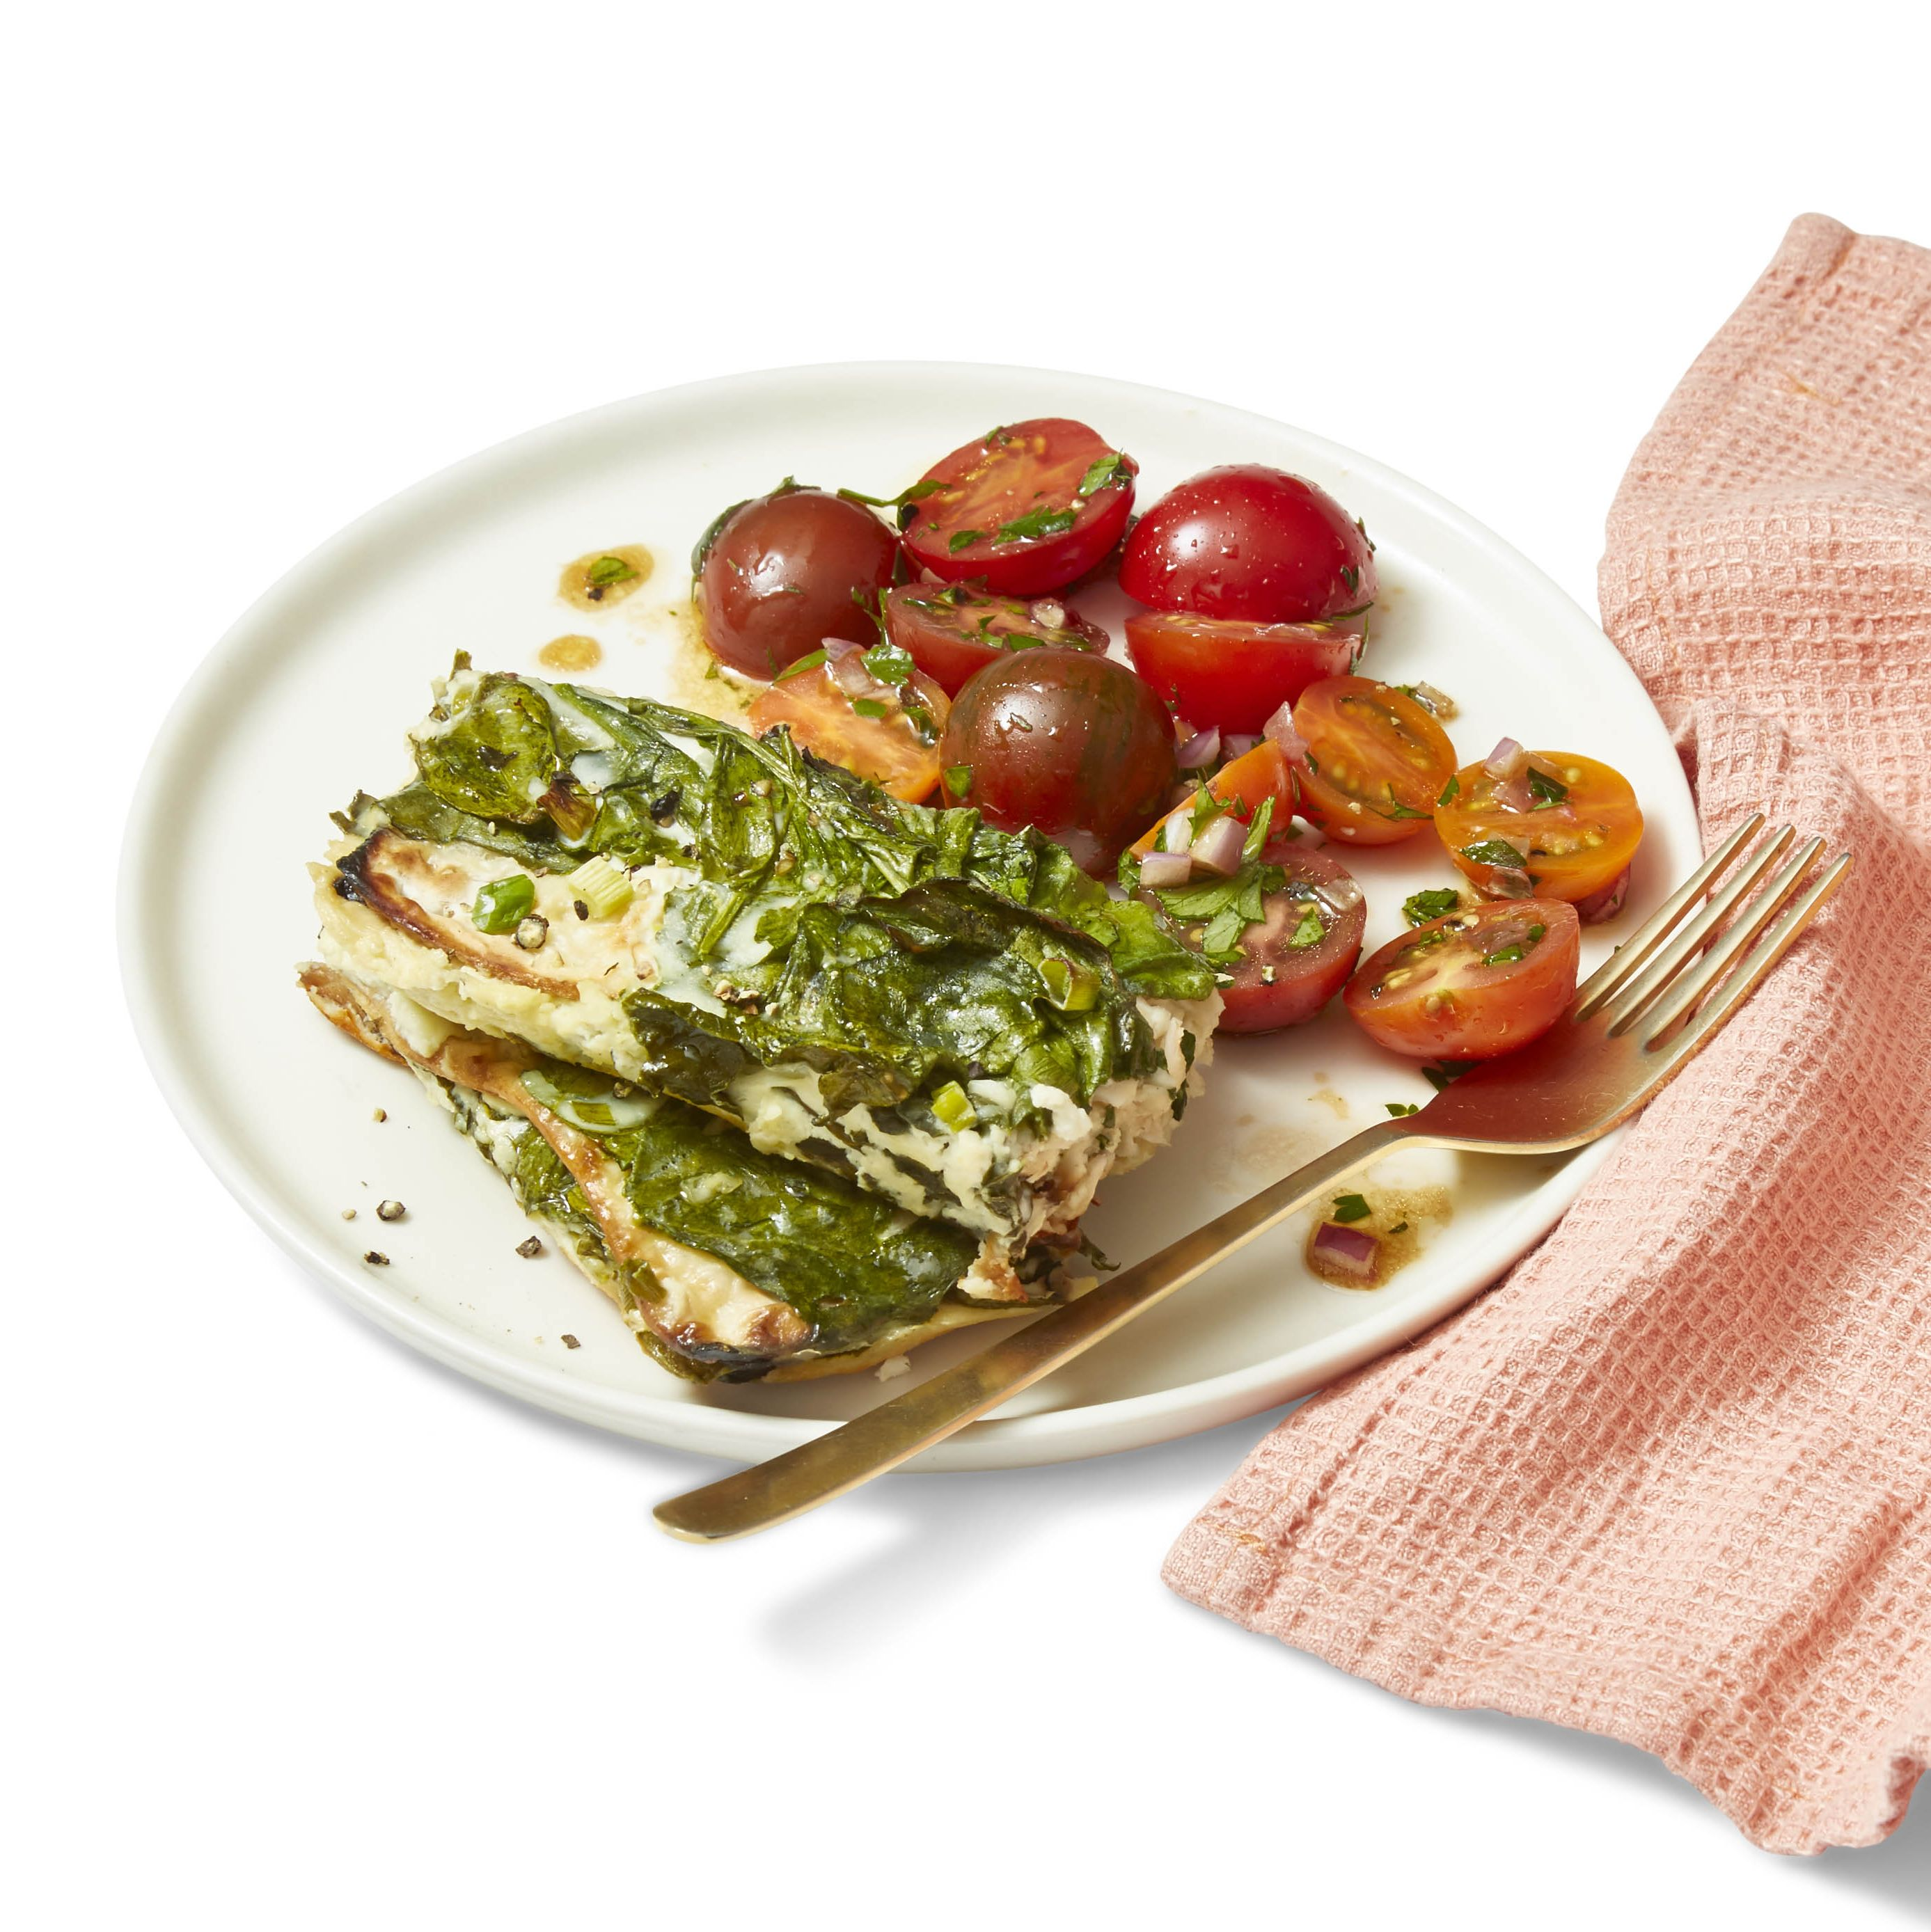 light dinner ideas -Cheesy Baked Spinach and Feta Casserole